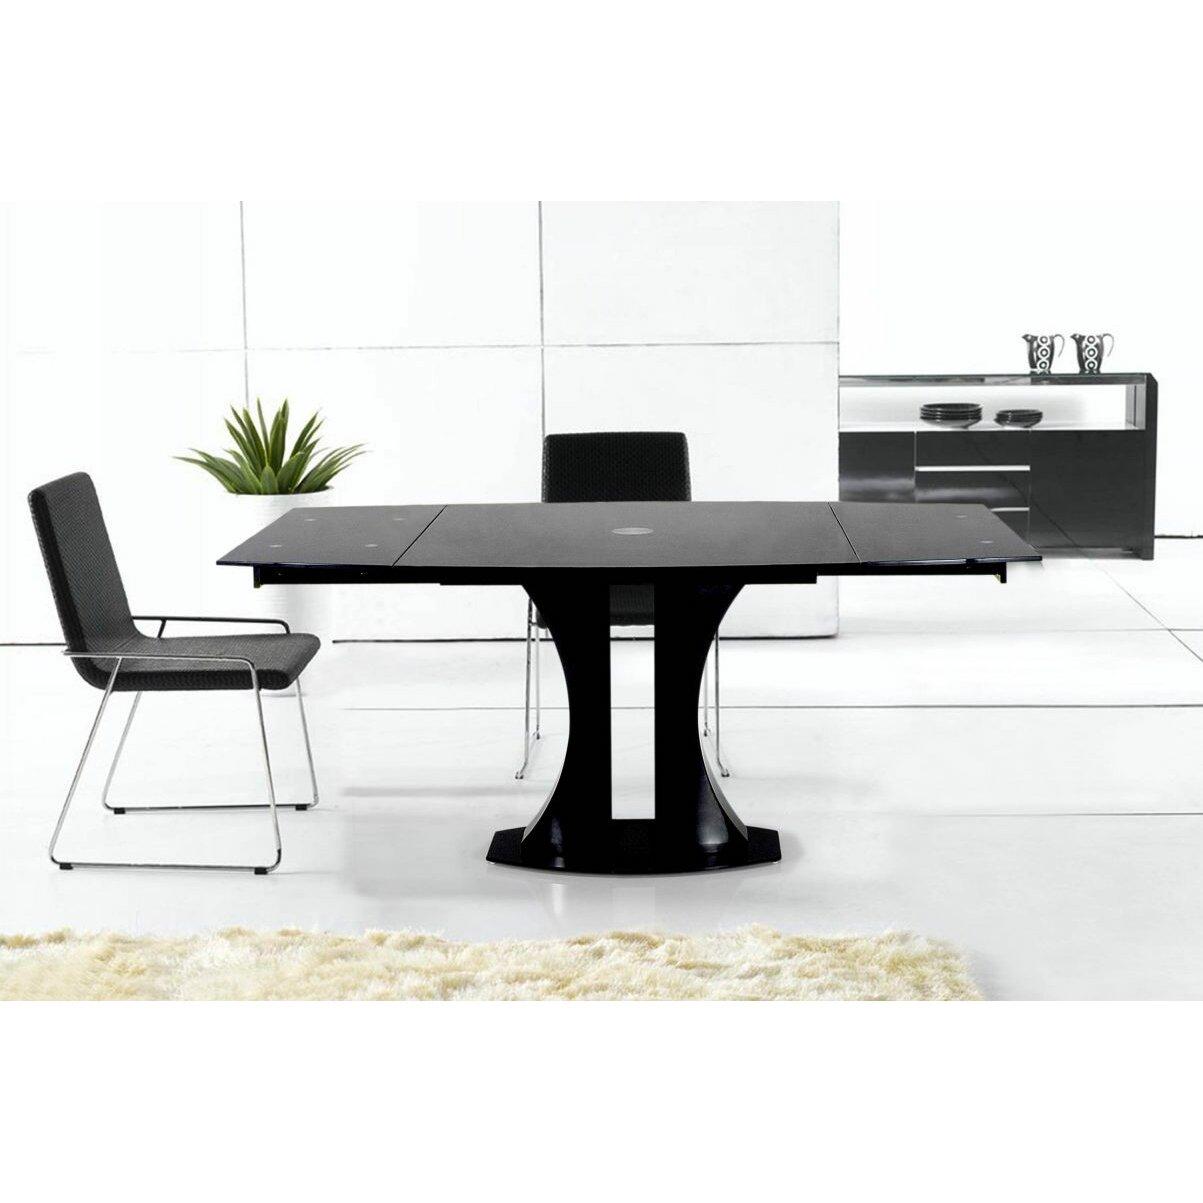 Vig Furniture Modrest Split Extendable Dining Table Reviews Wayfair